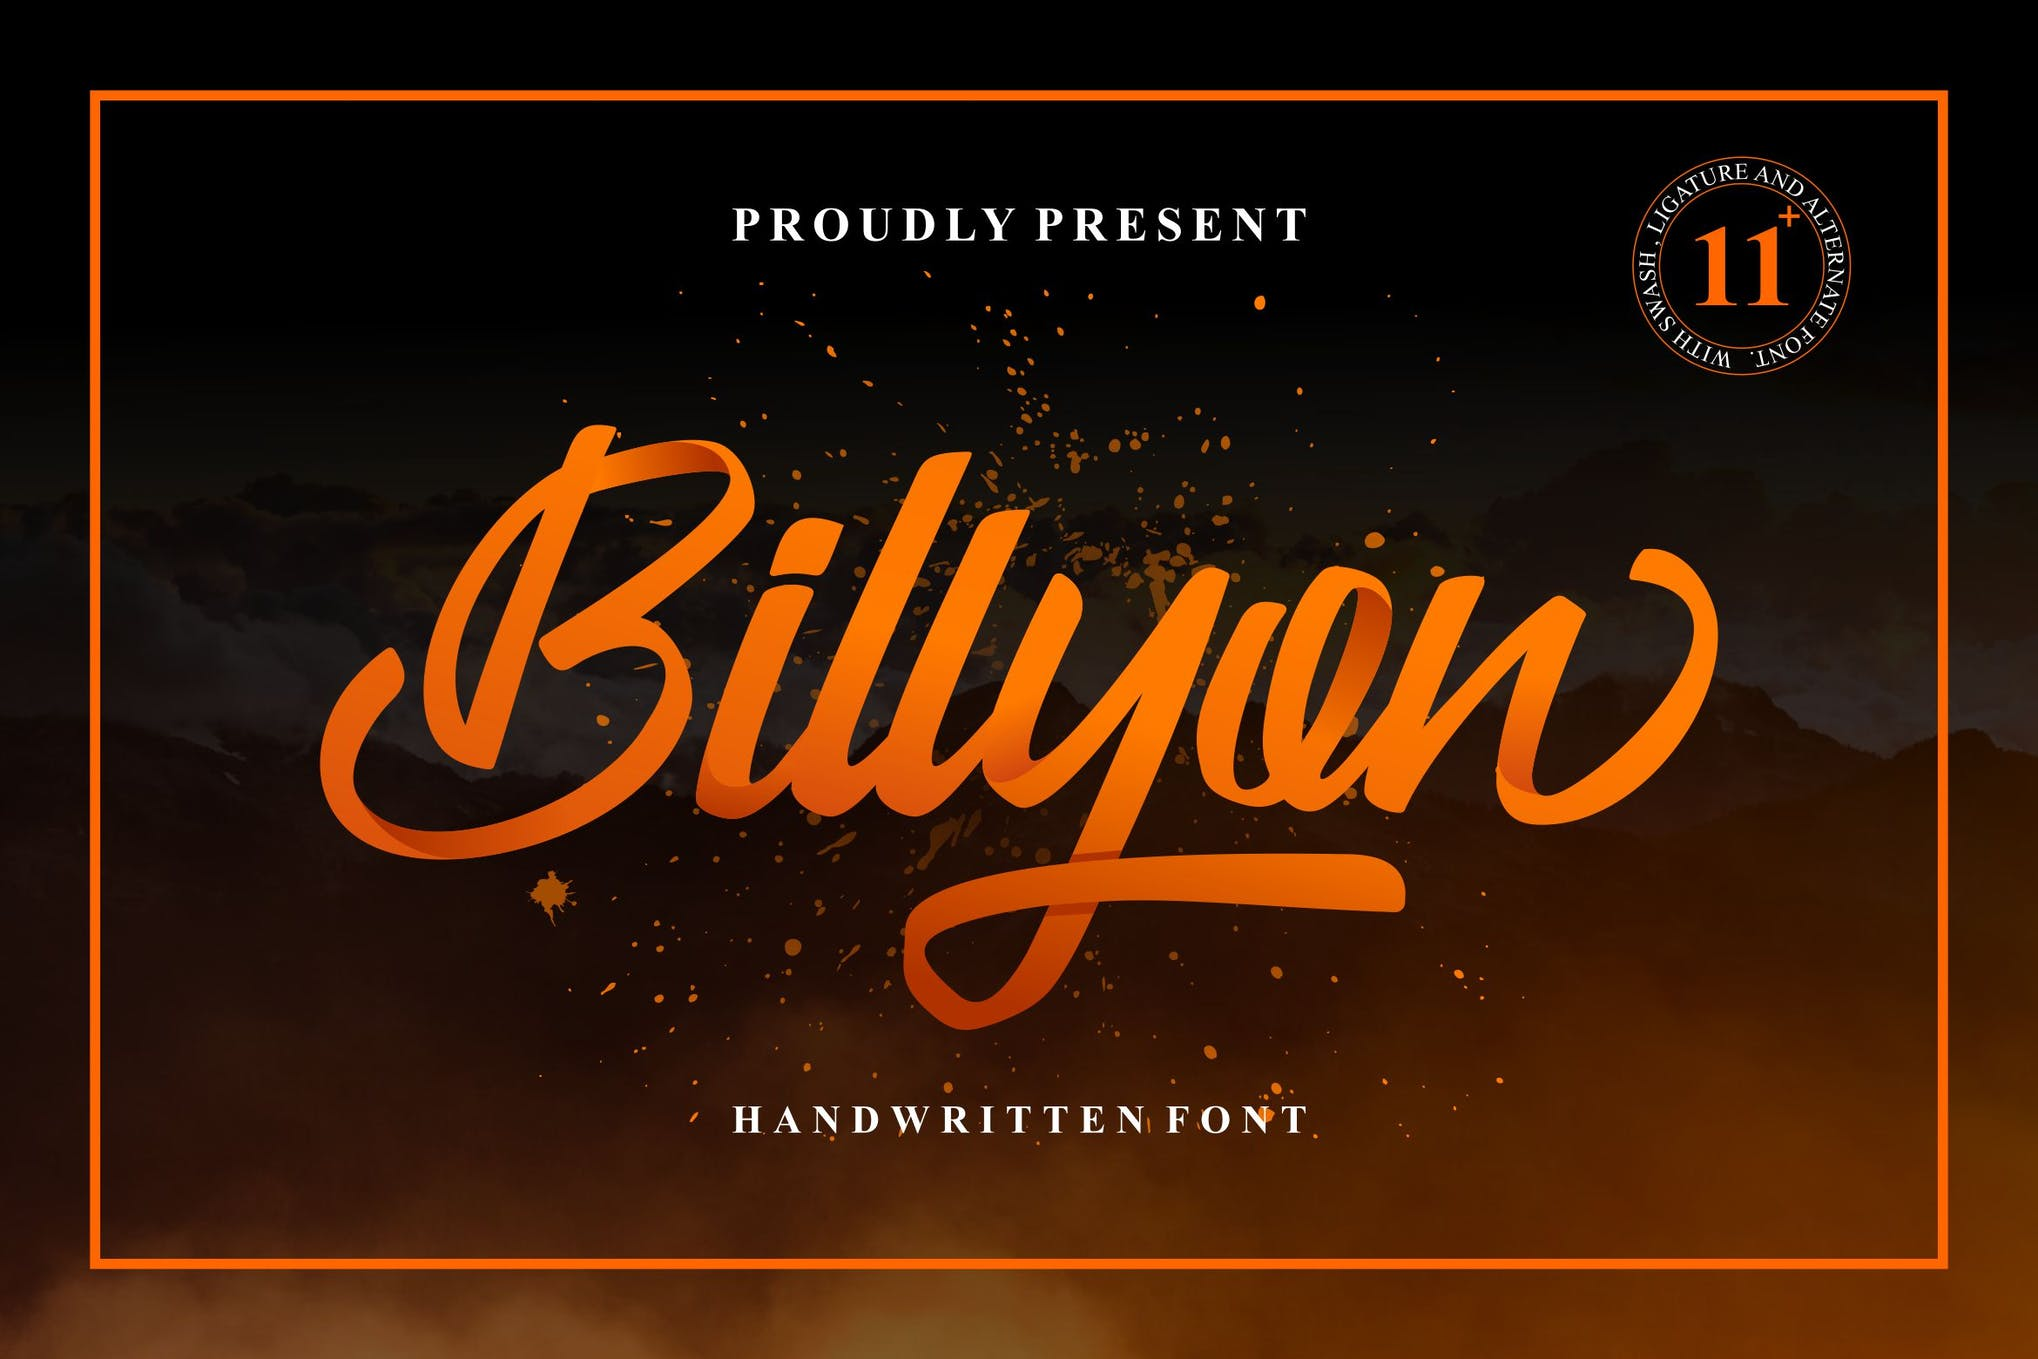 Billyon Handwriting Font